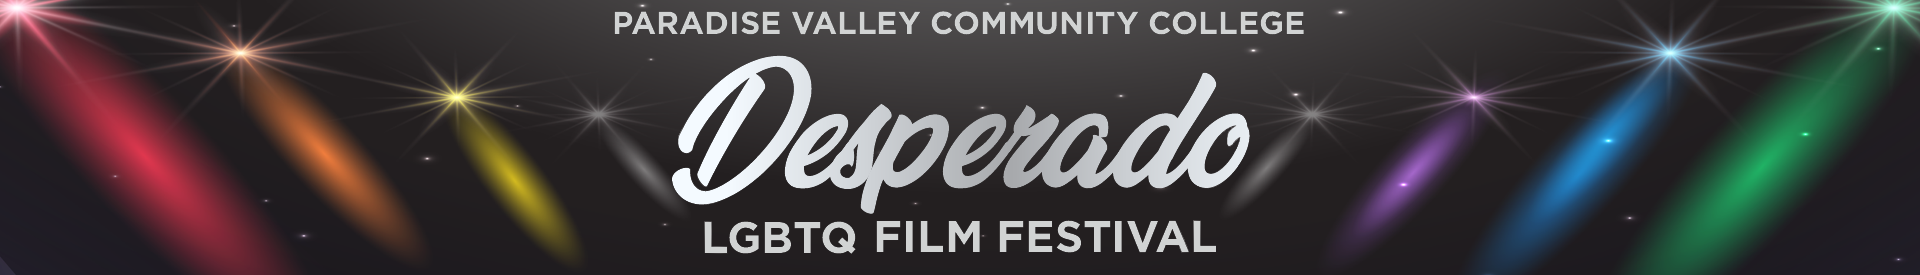 Desperado LGBTQ Film Festival